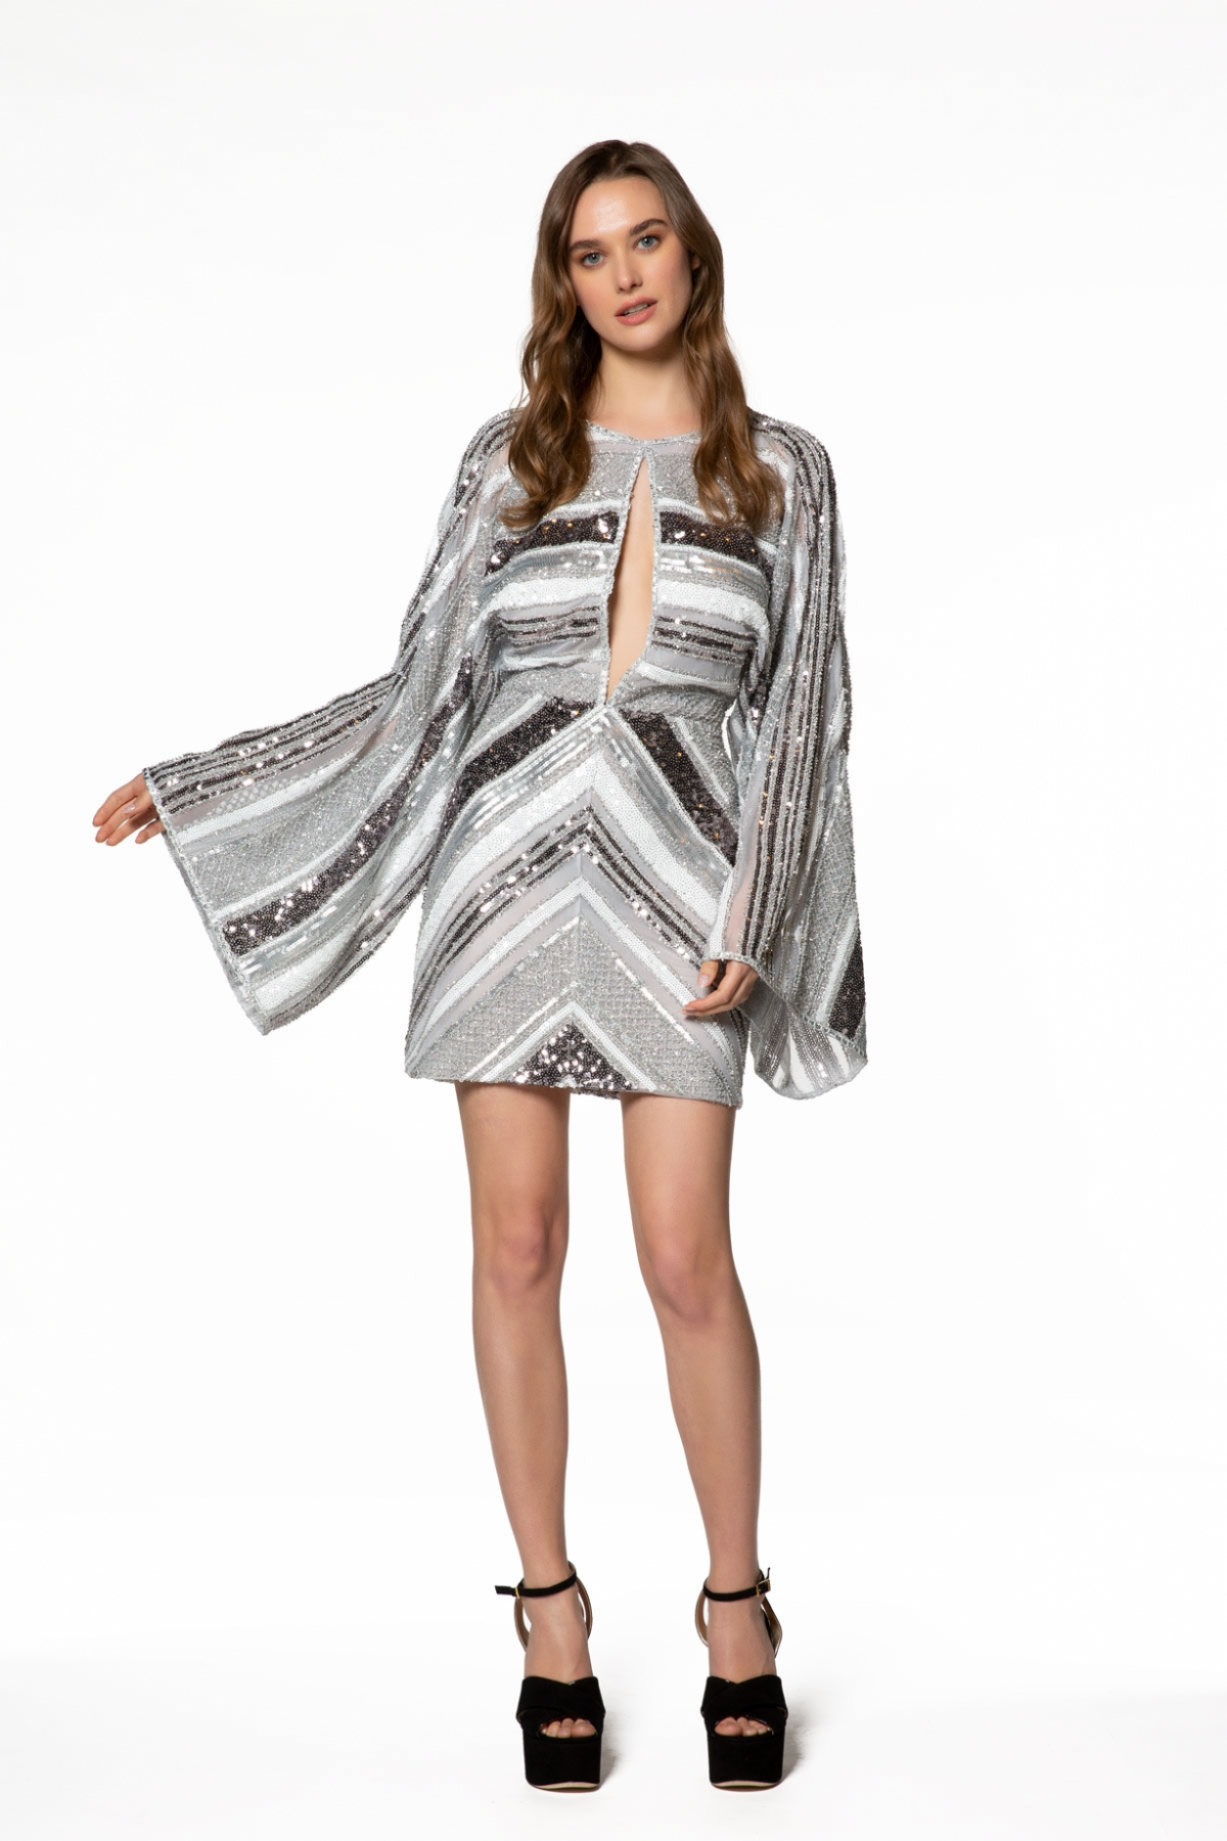 Parlak Payetli Mini Elbise